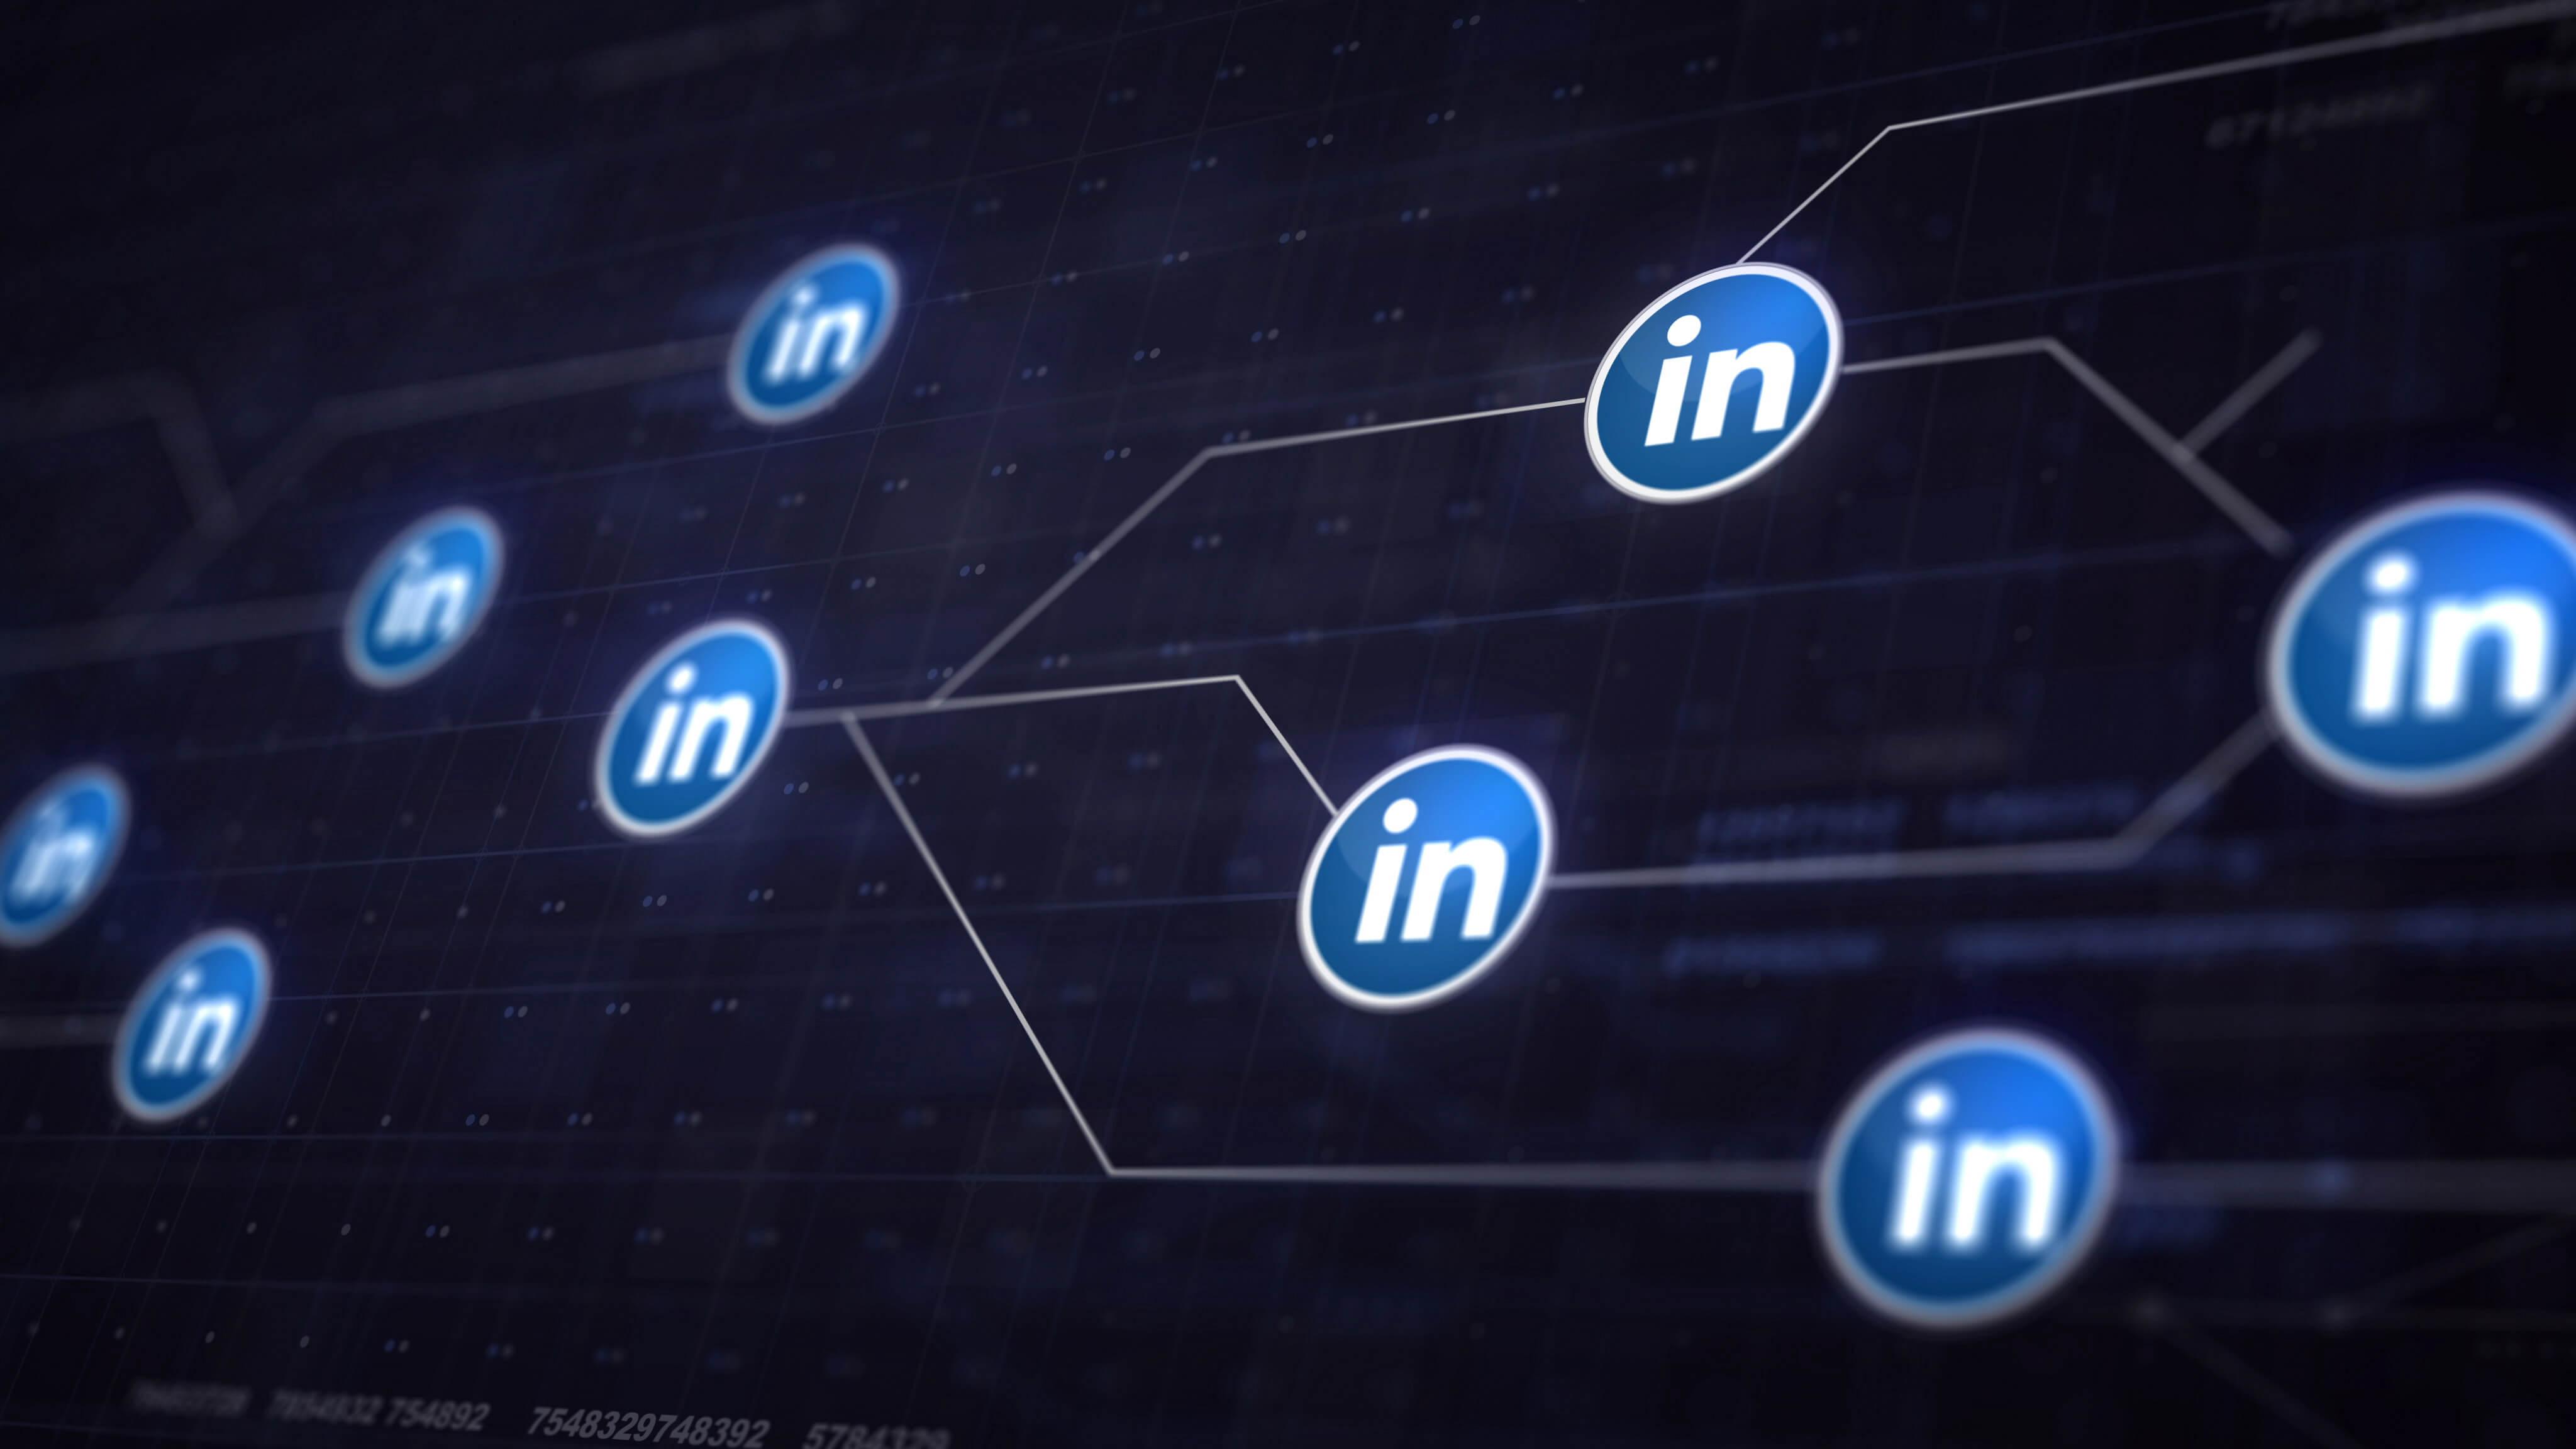 LinkedIn DigitallyNext